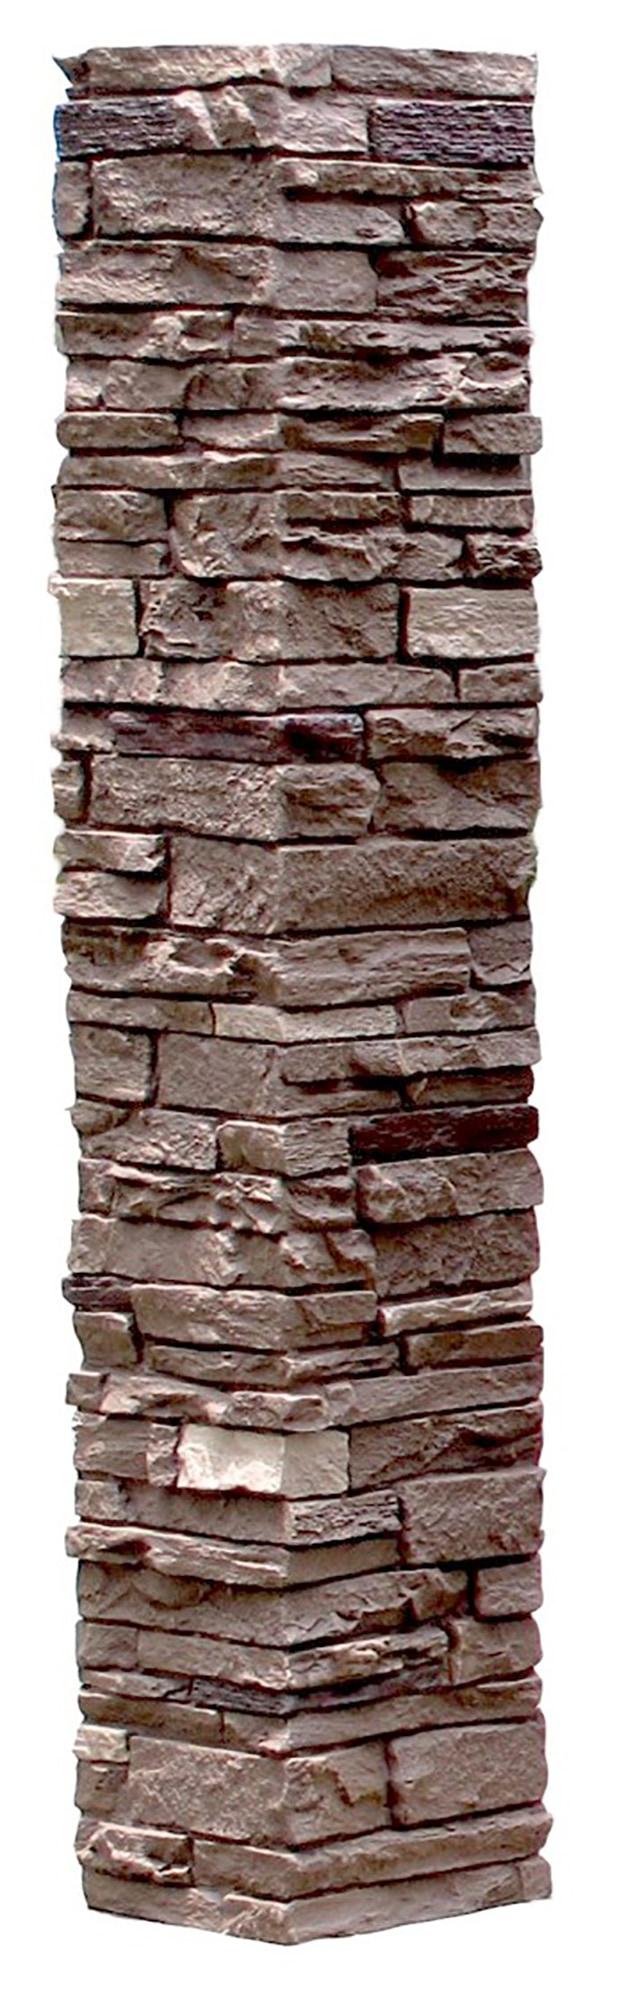 Sienna / Slatestone Faux Stone - 2 Piece Railing Post Covers 0